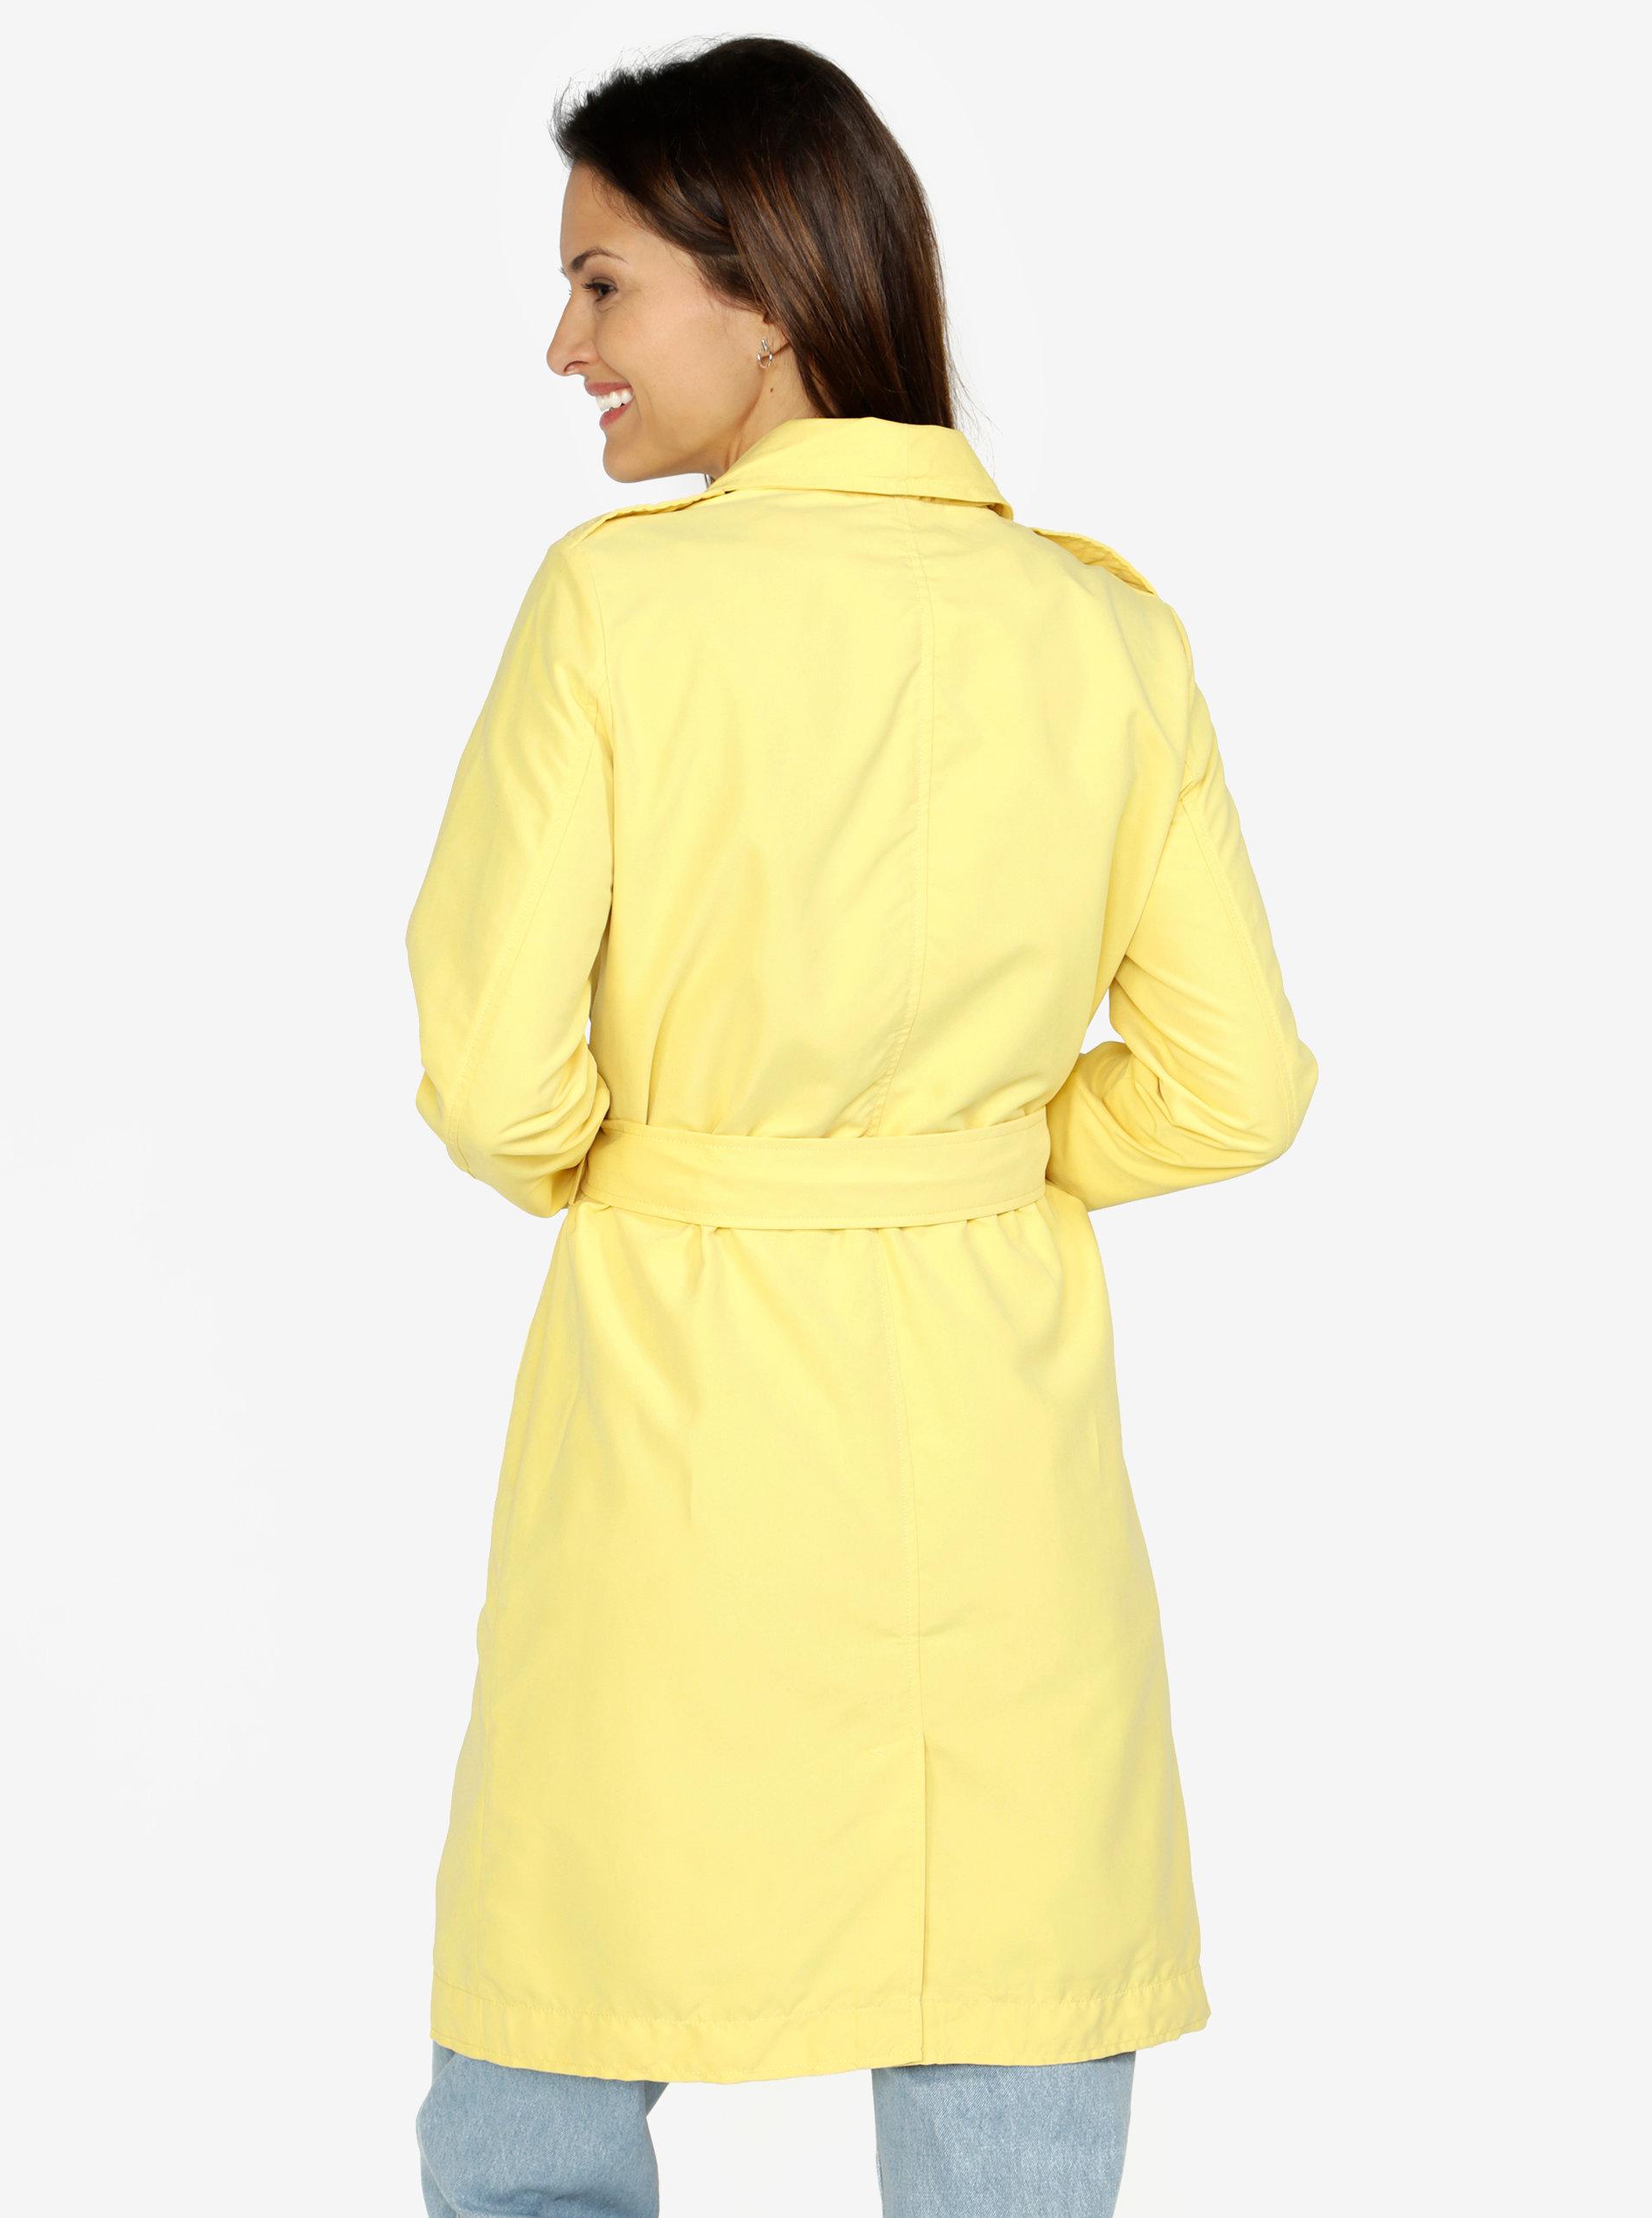 Žlutý kabát VERO MODA Elina ... 7600cb4eff3